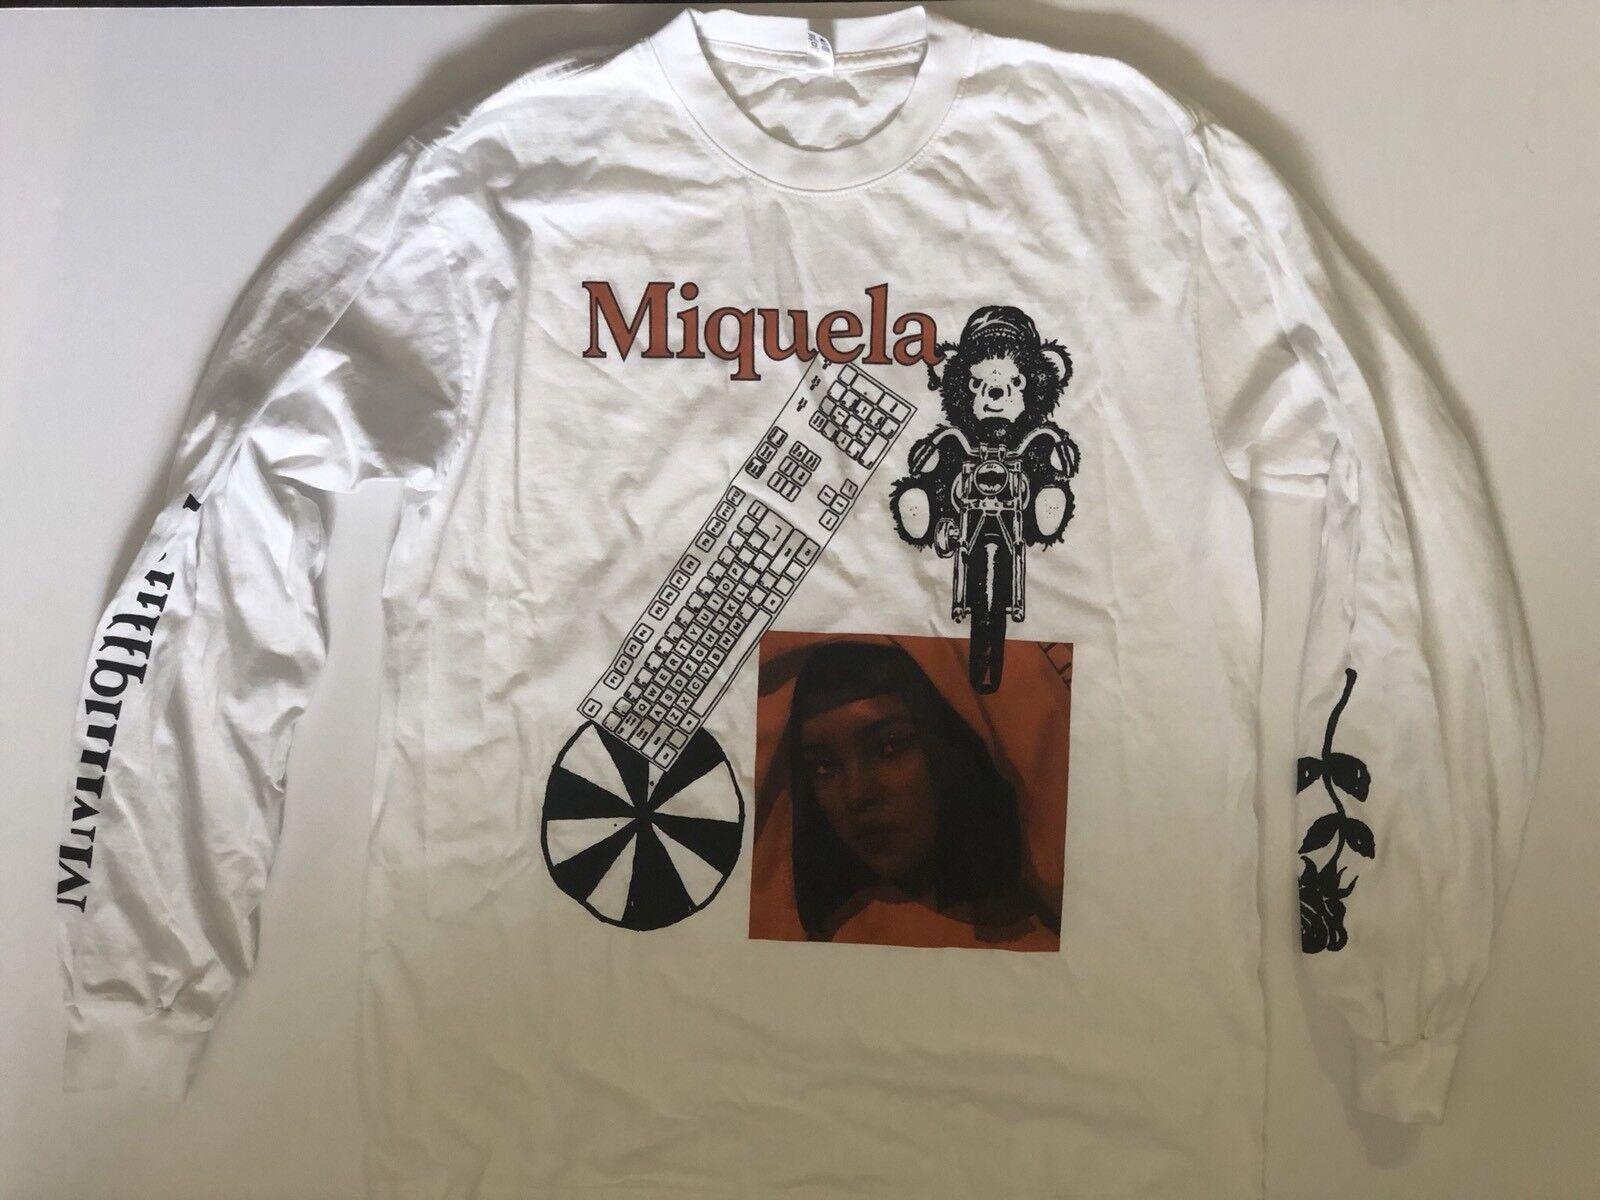 Rare High Snobiety X Barney's The Drop Lil Miquela Online Ceramics T-Shirt Large